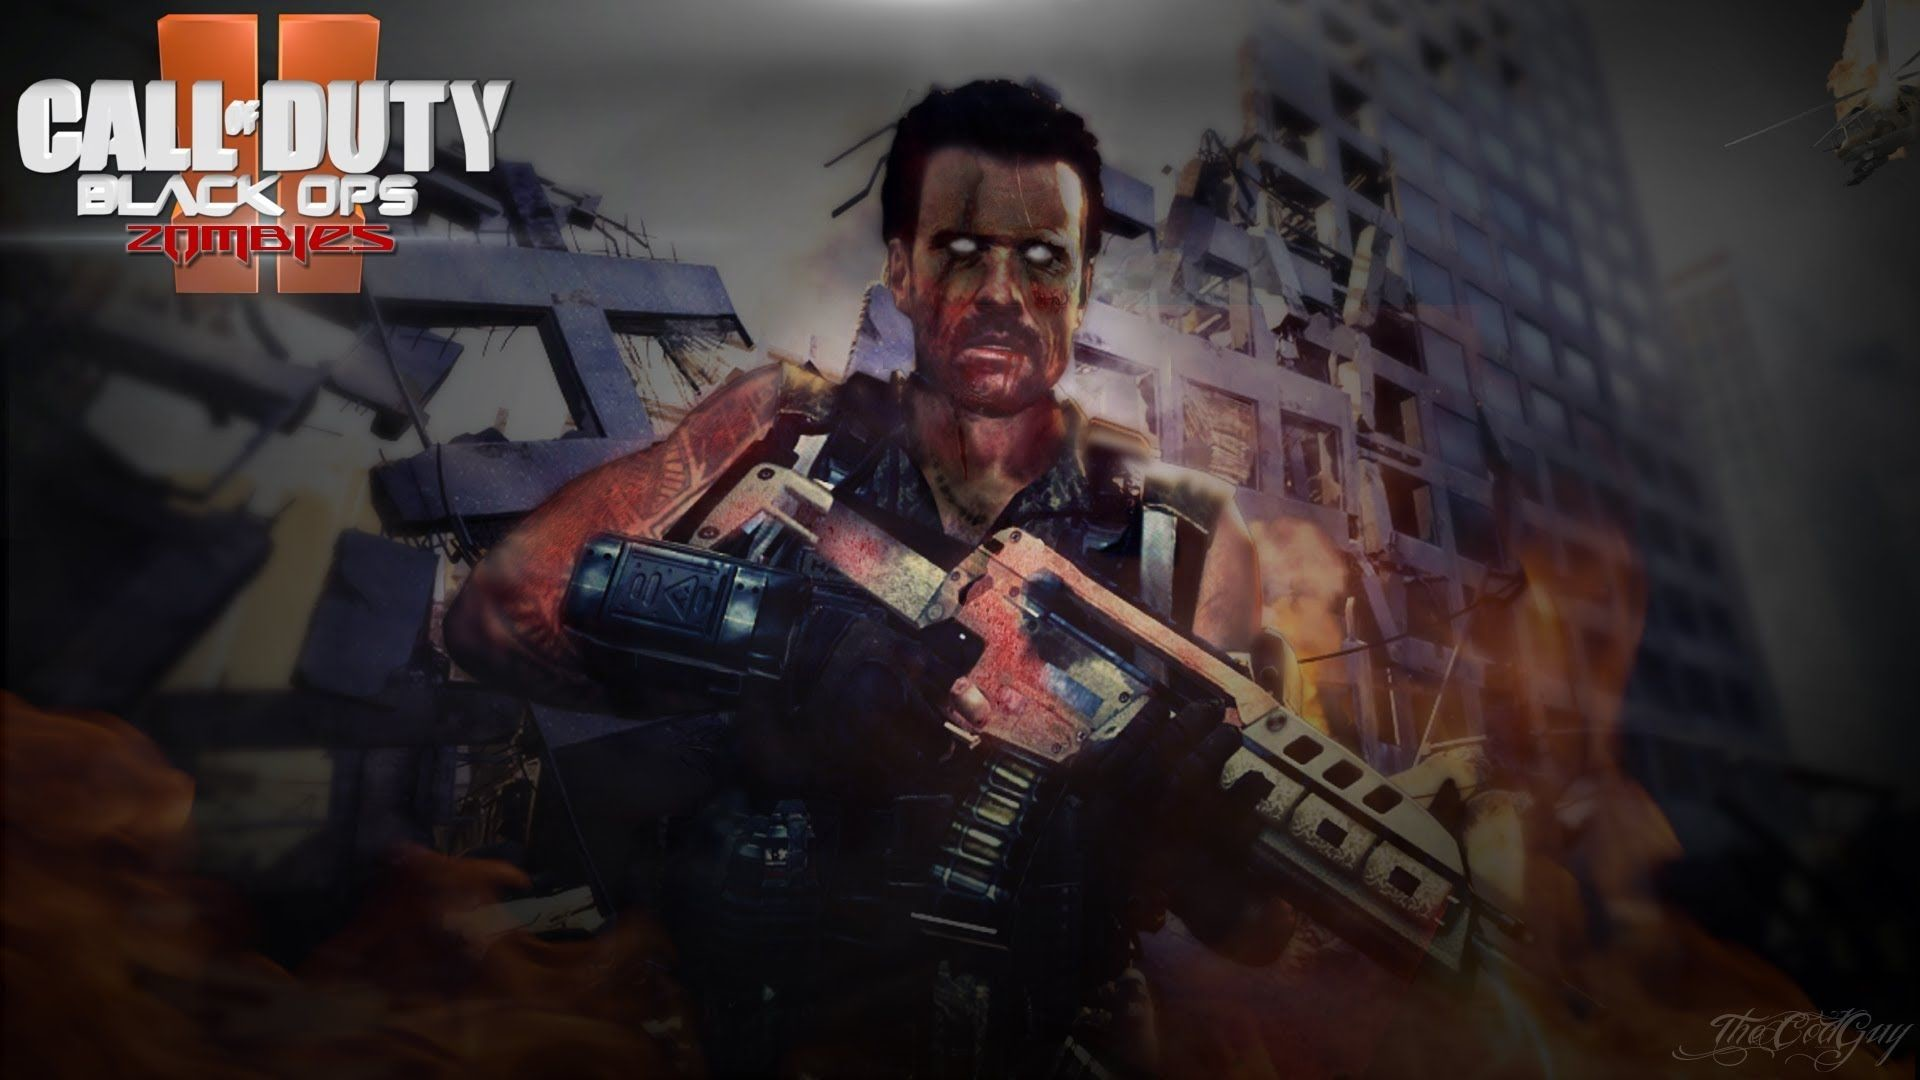 FREE Zombies Black Ops 2 Wallpaper Speed Art (Download in .